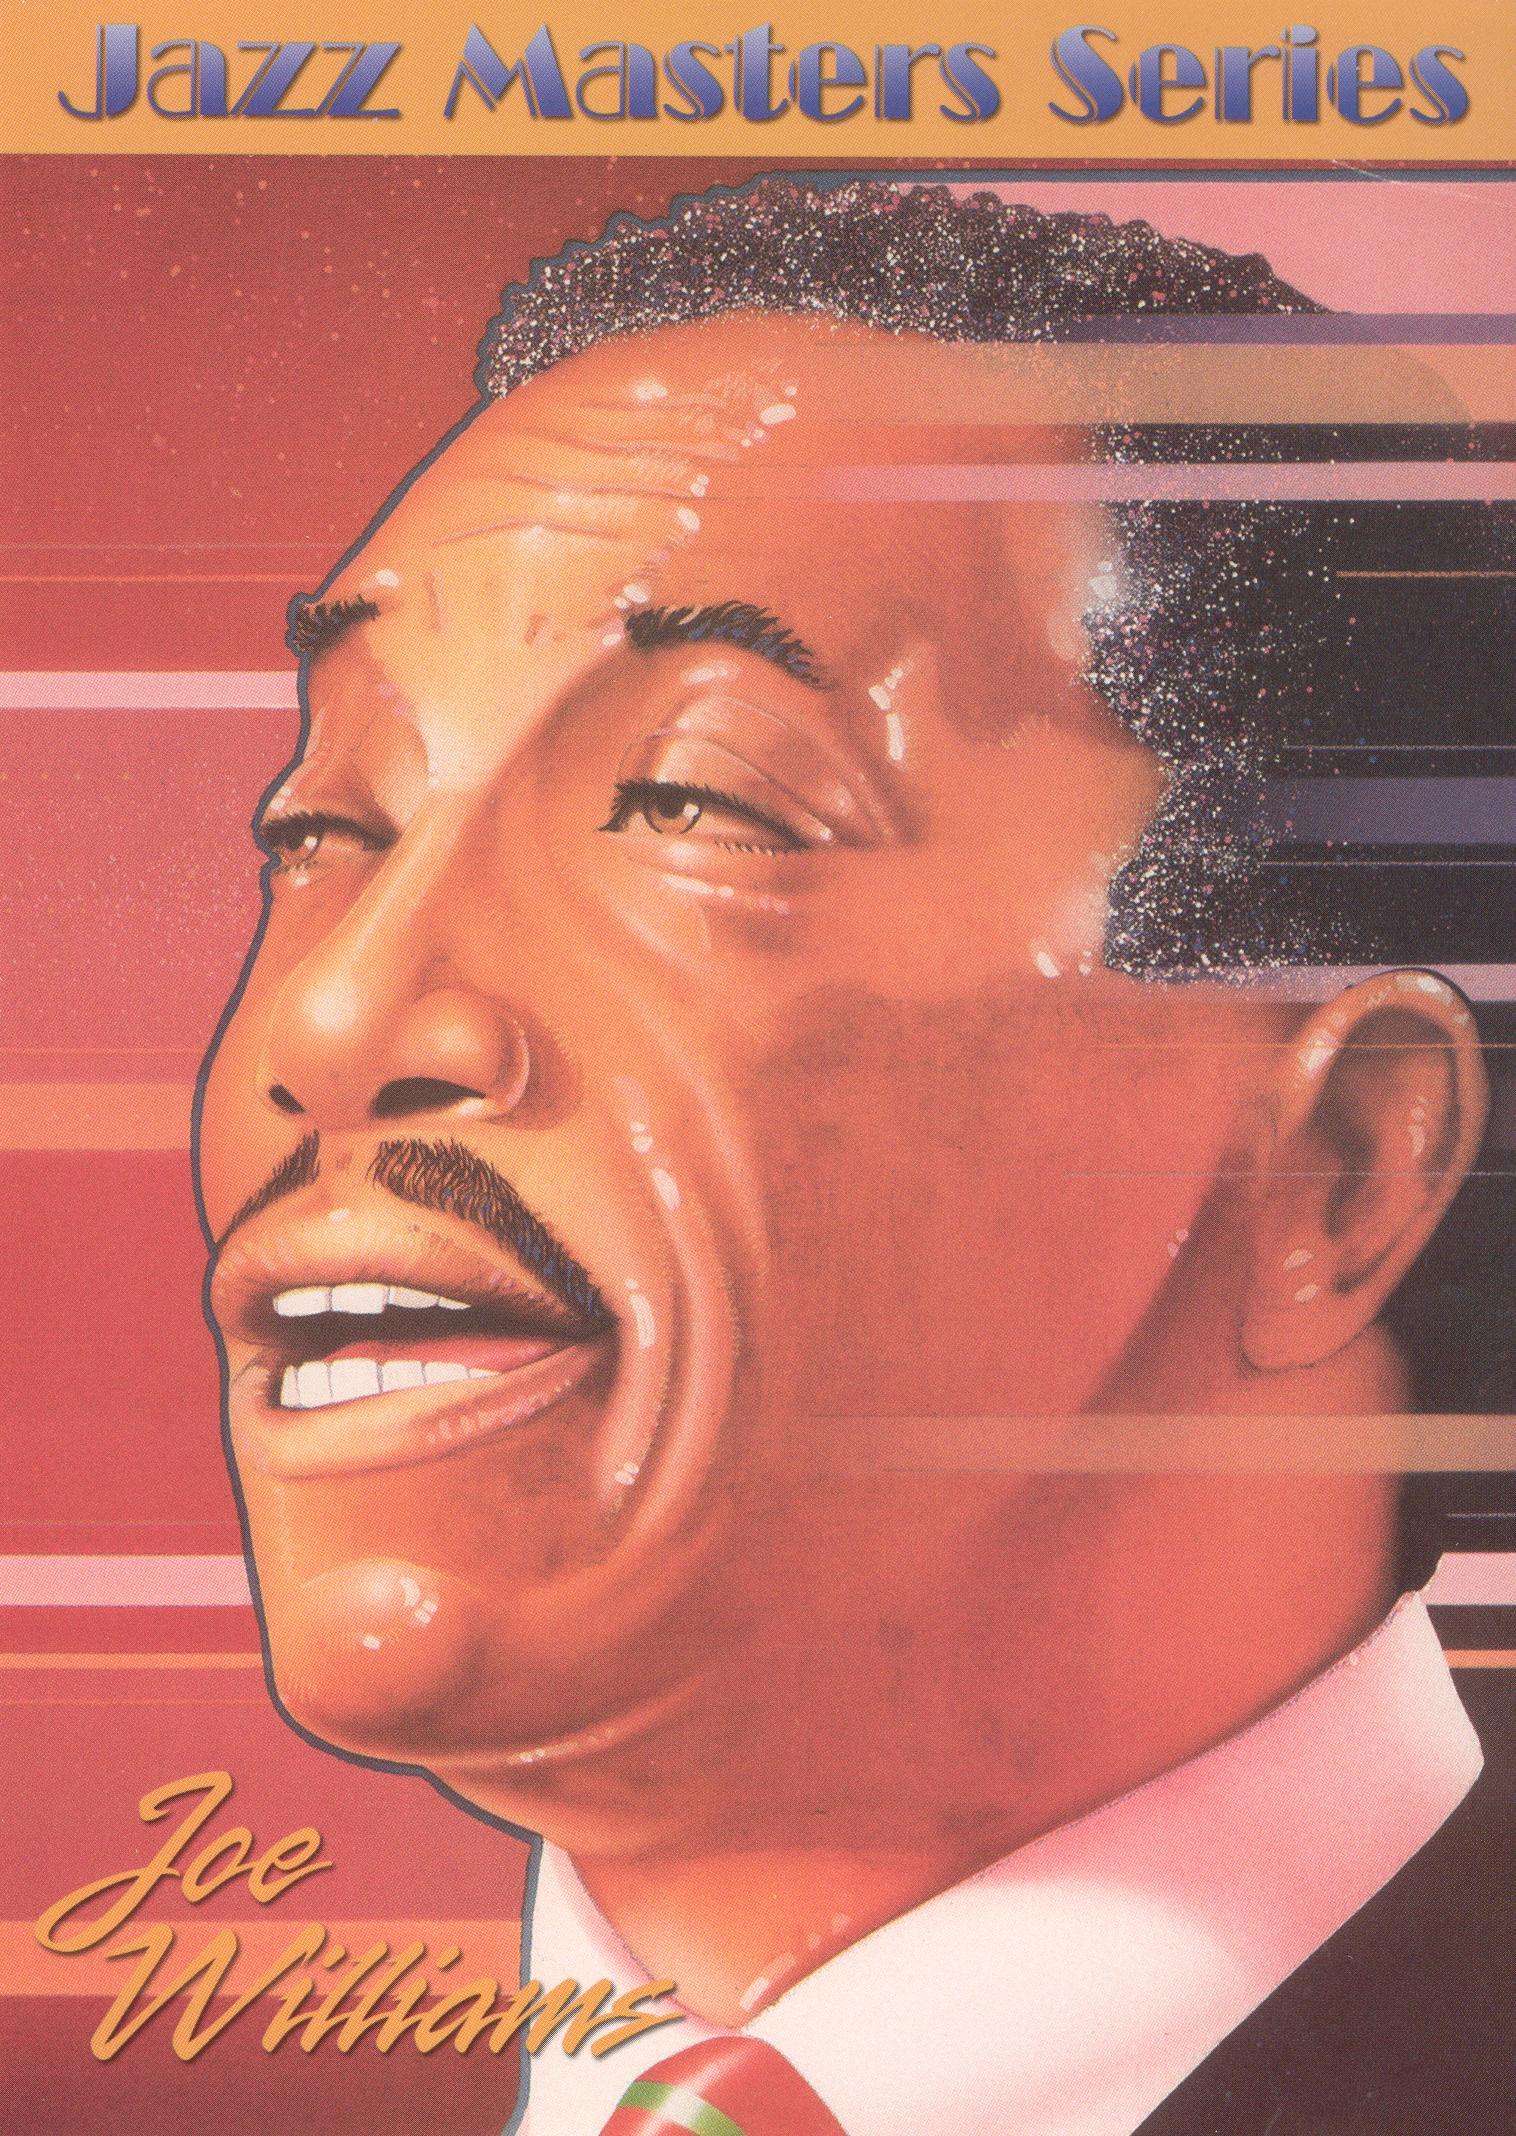 Joe Williams: Jazz Masters Series